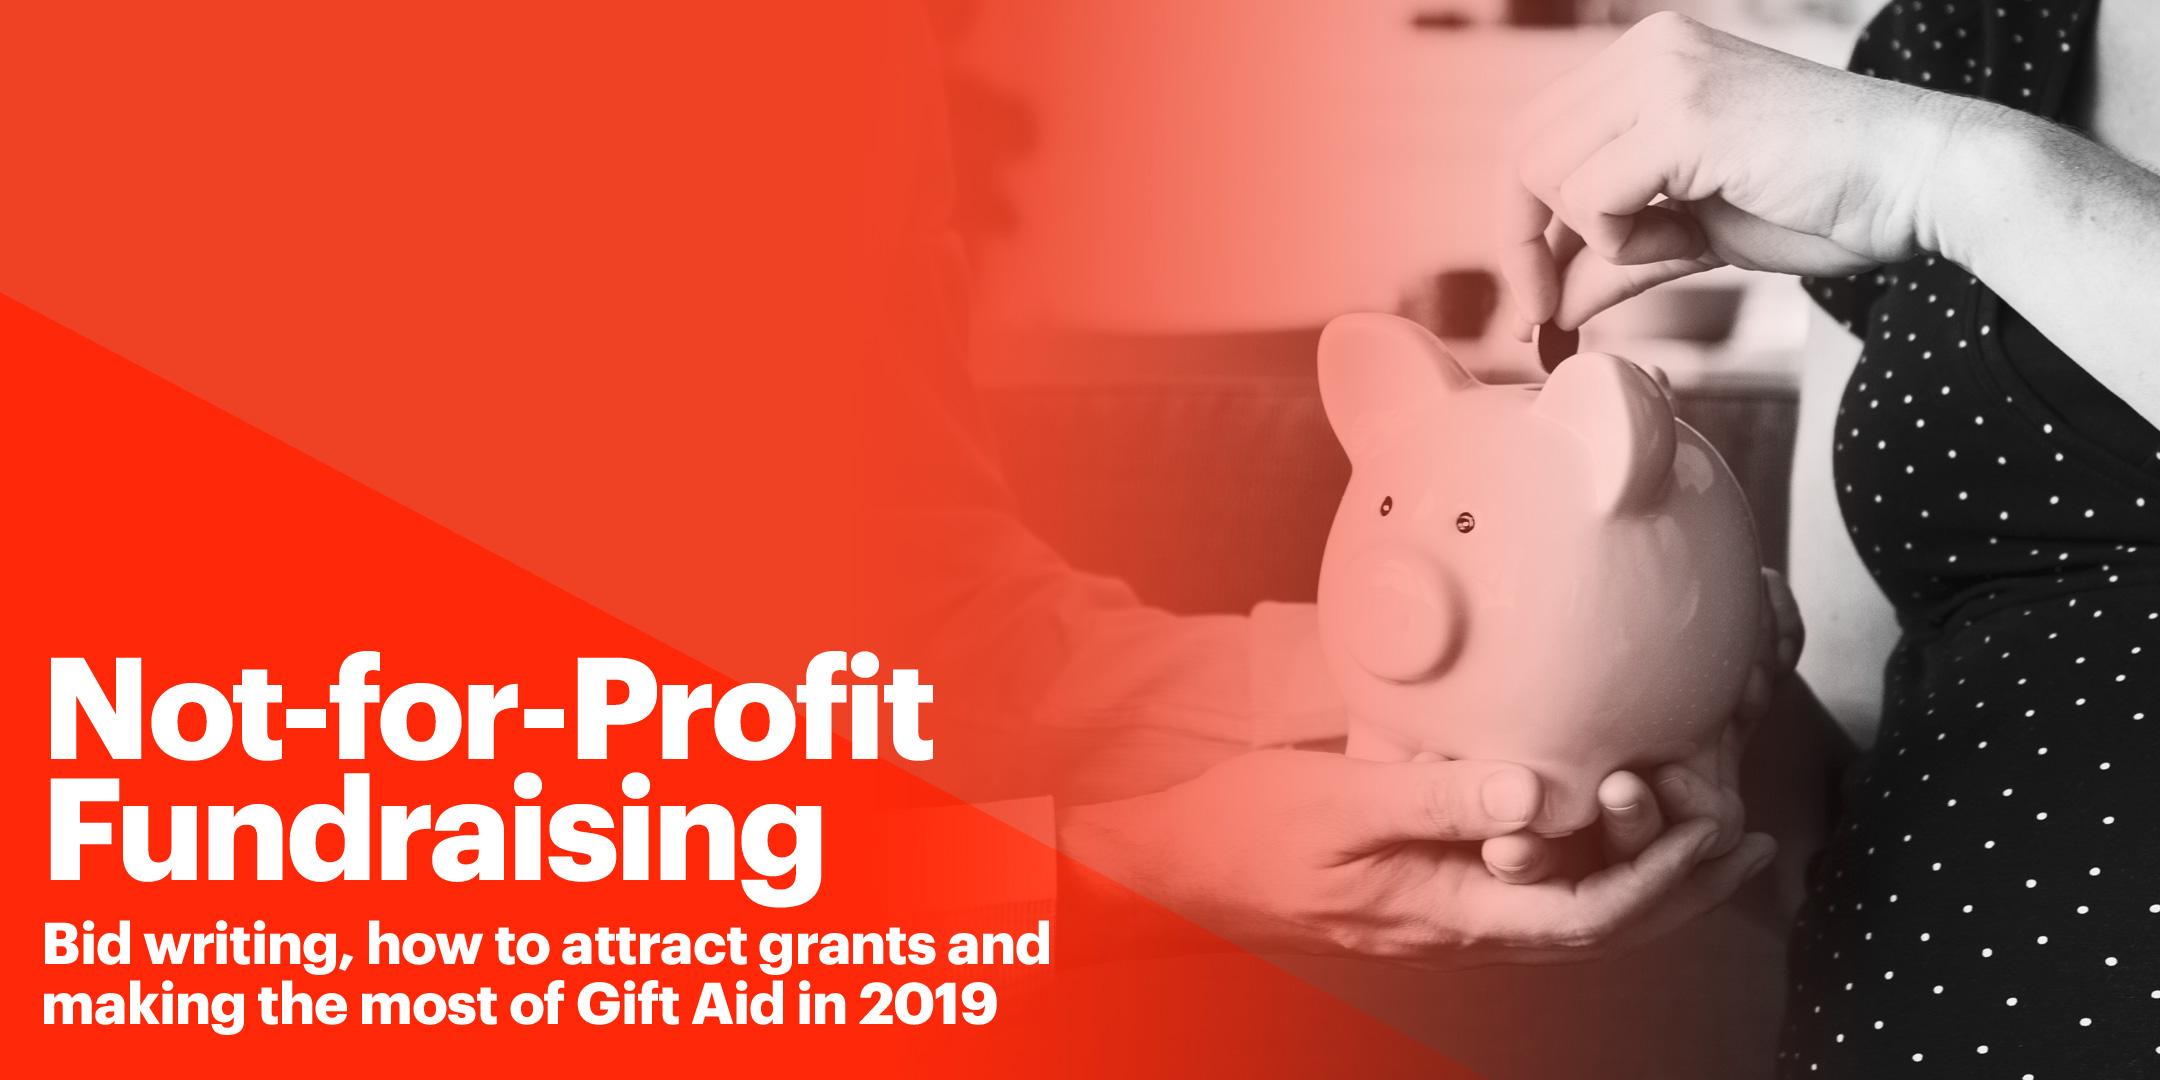 Not For Profit Fundraising Seminar, Manchester, Saturday 2nd November